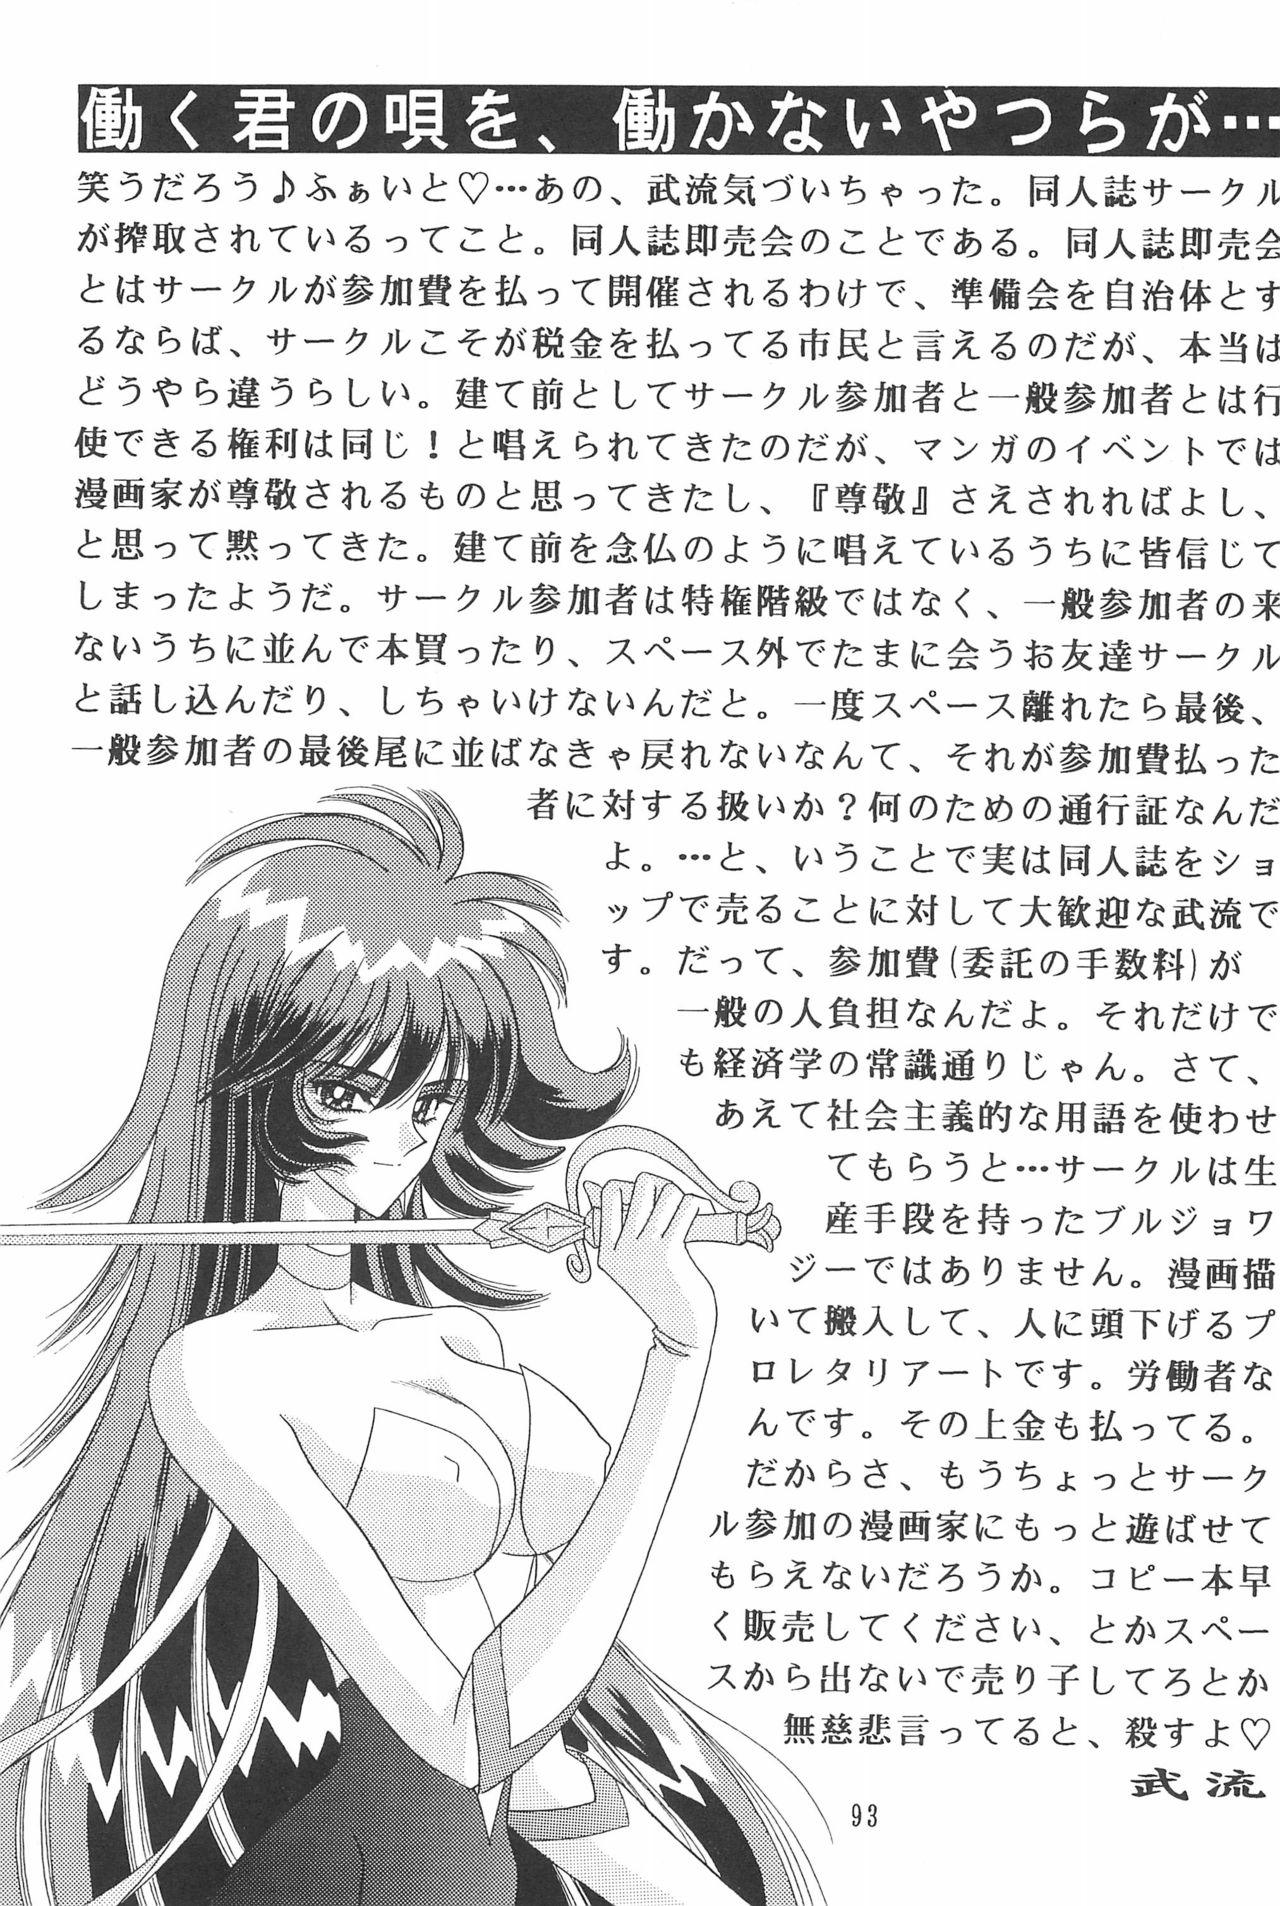 Showbaku 94